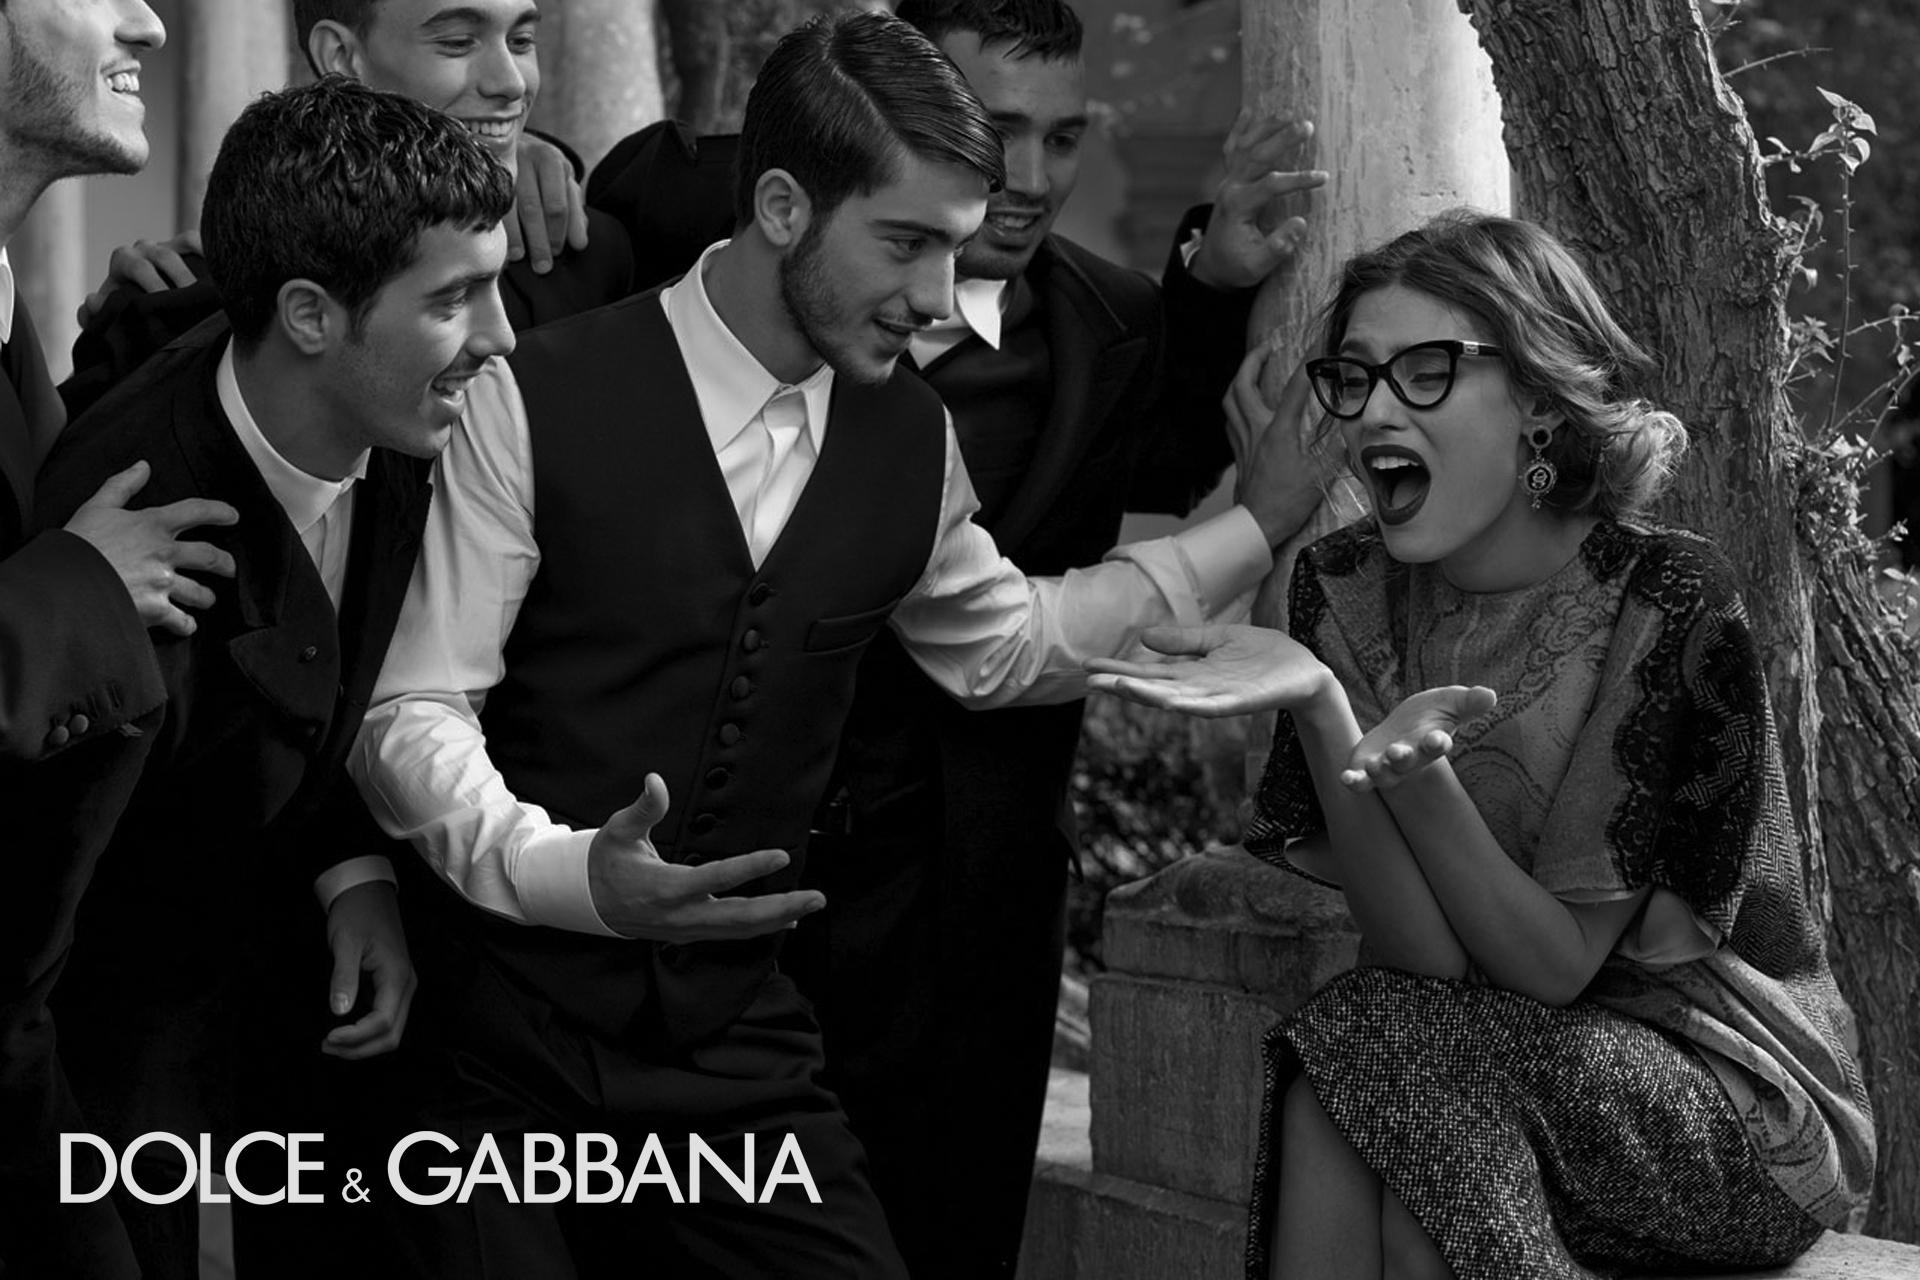 Dolce & Gabbana Designer Brand